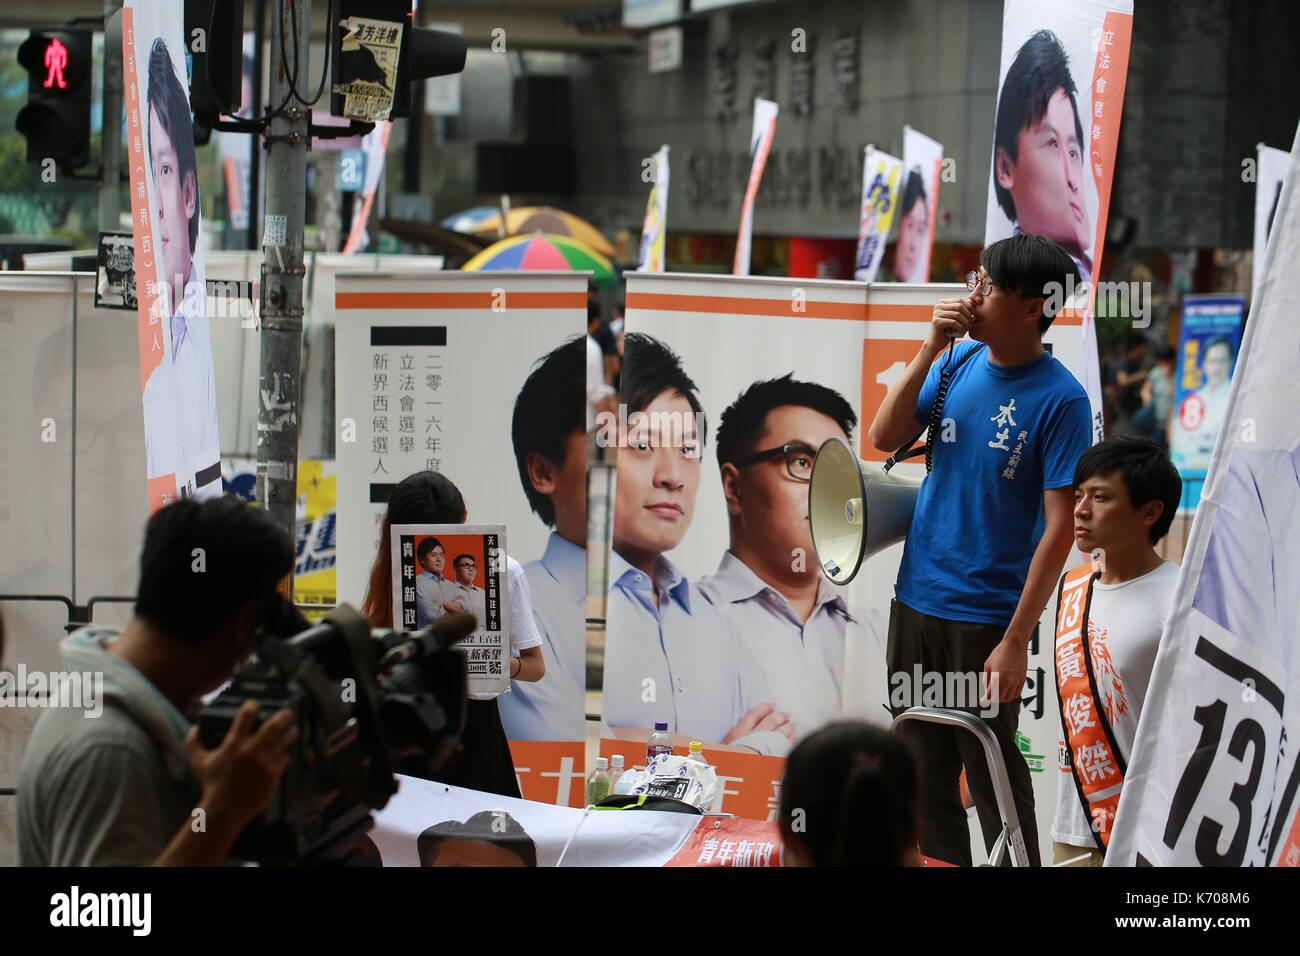 Edward Leung Tin kei, leader of Hong Kong Indigenous present in the street  in hong kong Stock Photo